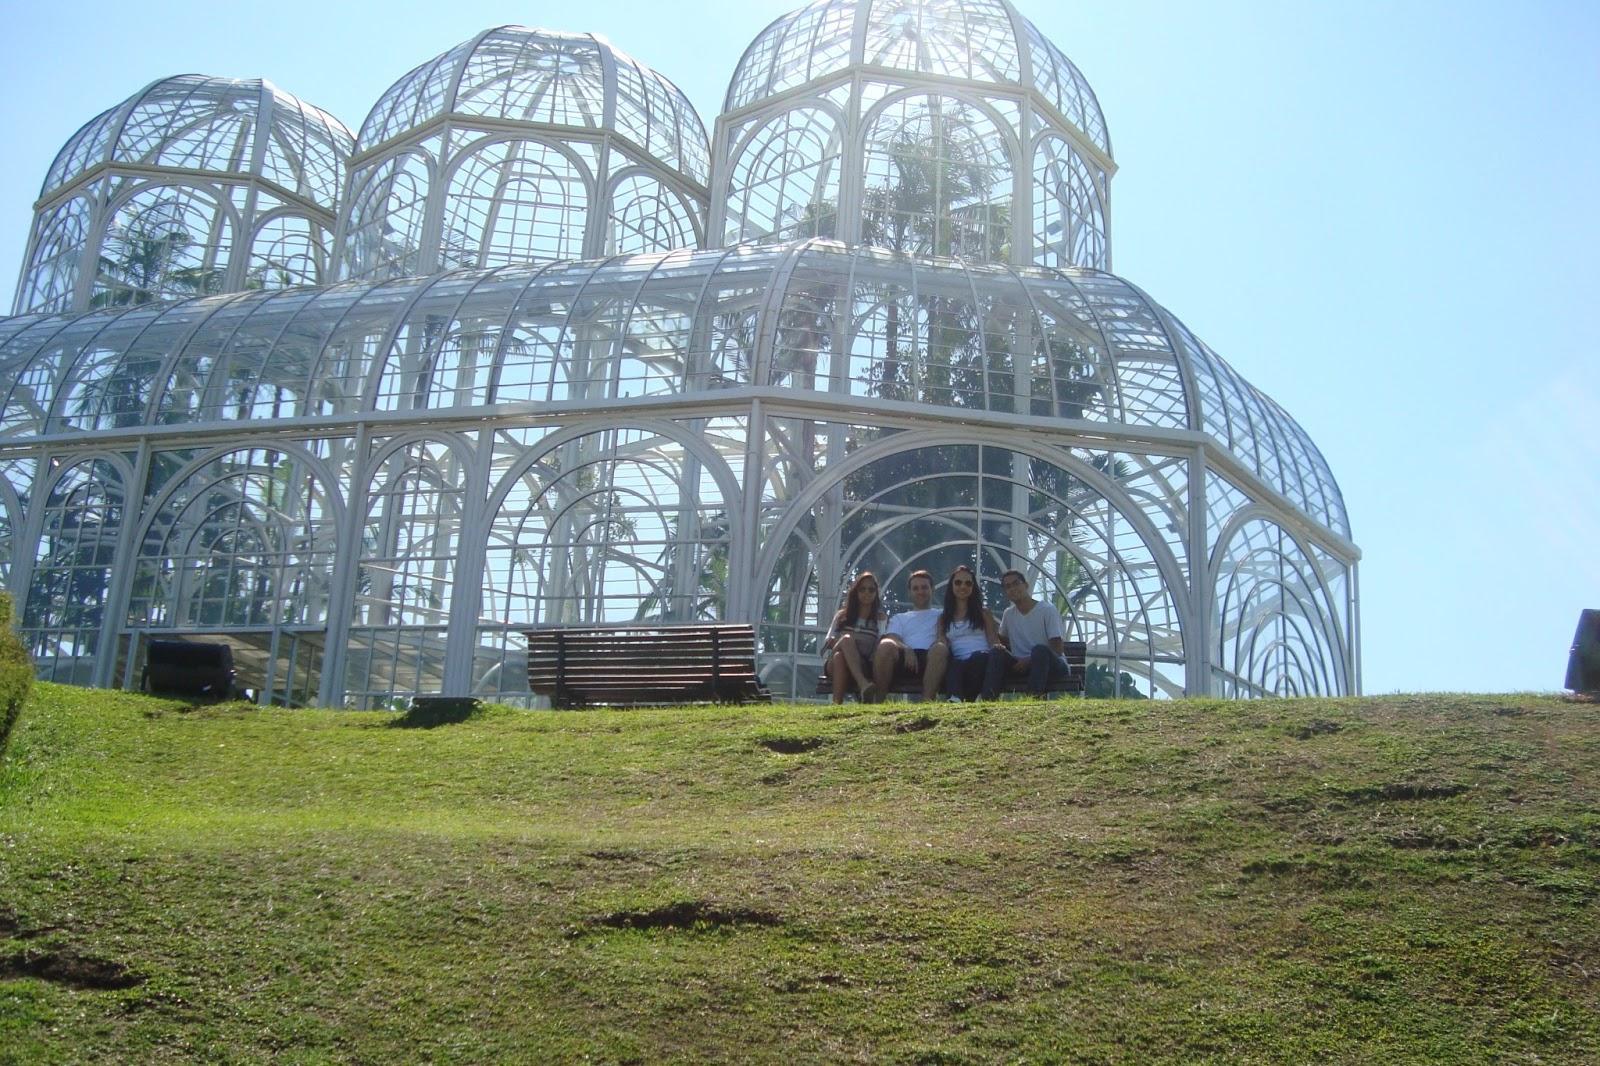 mesa jardim curitiba:Lumiar: Jardim Botânico de Curitiba